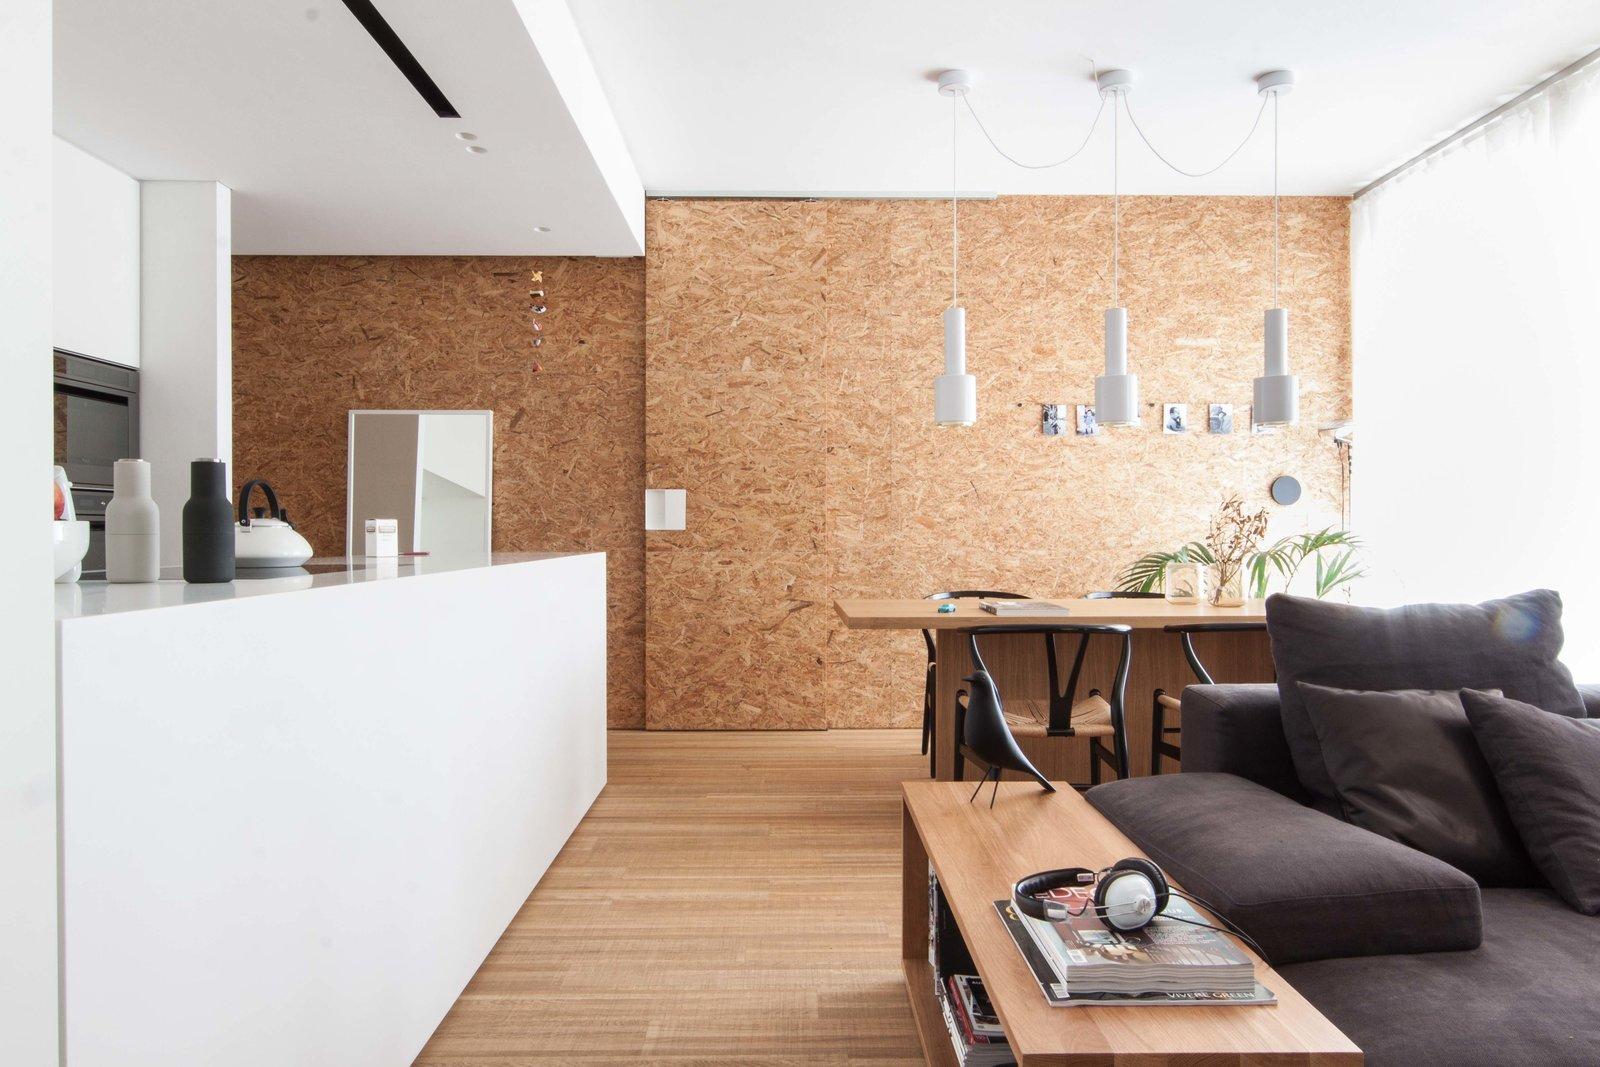 Tagged: Living Room, Ceiling Lighting, Pendant Lighting, Bench, Sofa, and Medium Hardwood Floor.  Interior LP by Didonè Comacchio